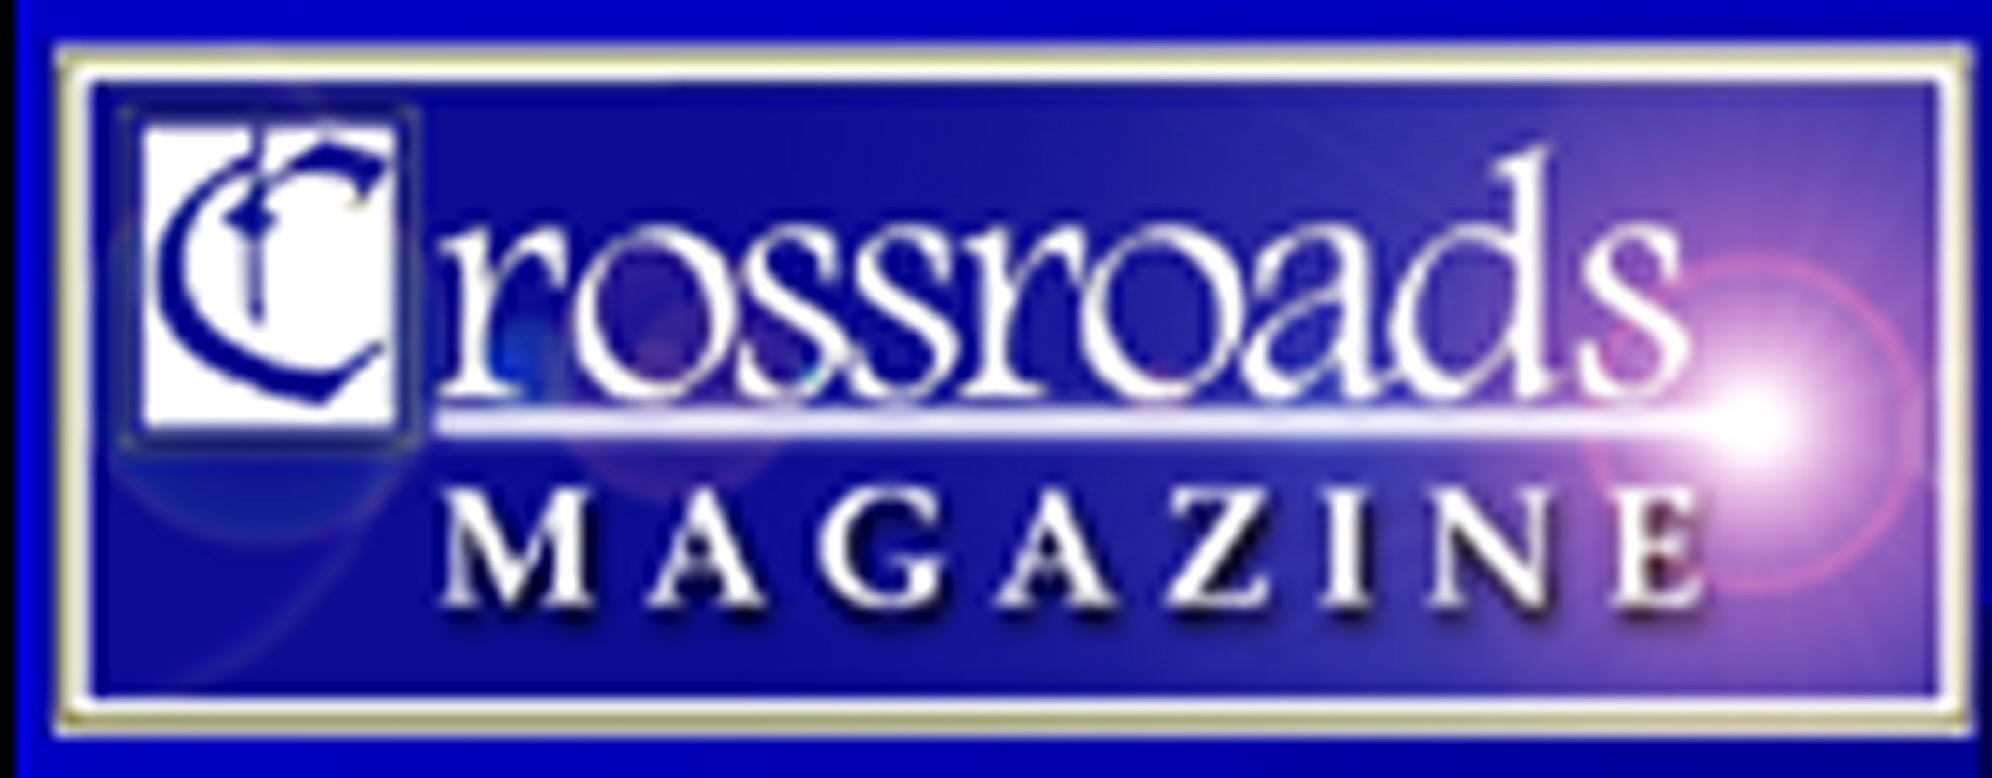 Office of Radio & Television Crossroads Magazine Page